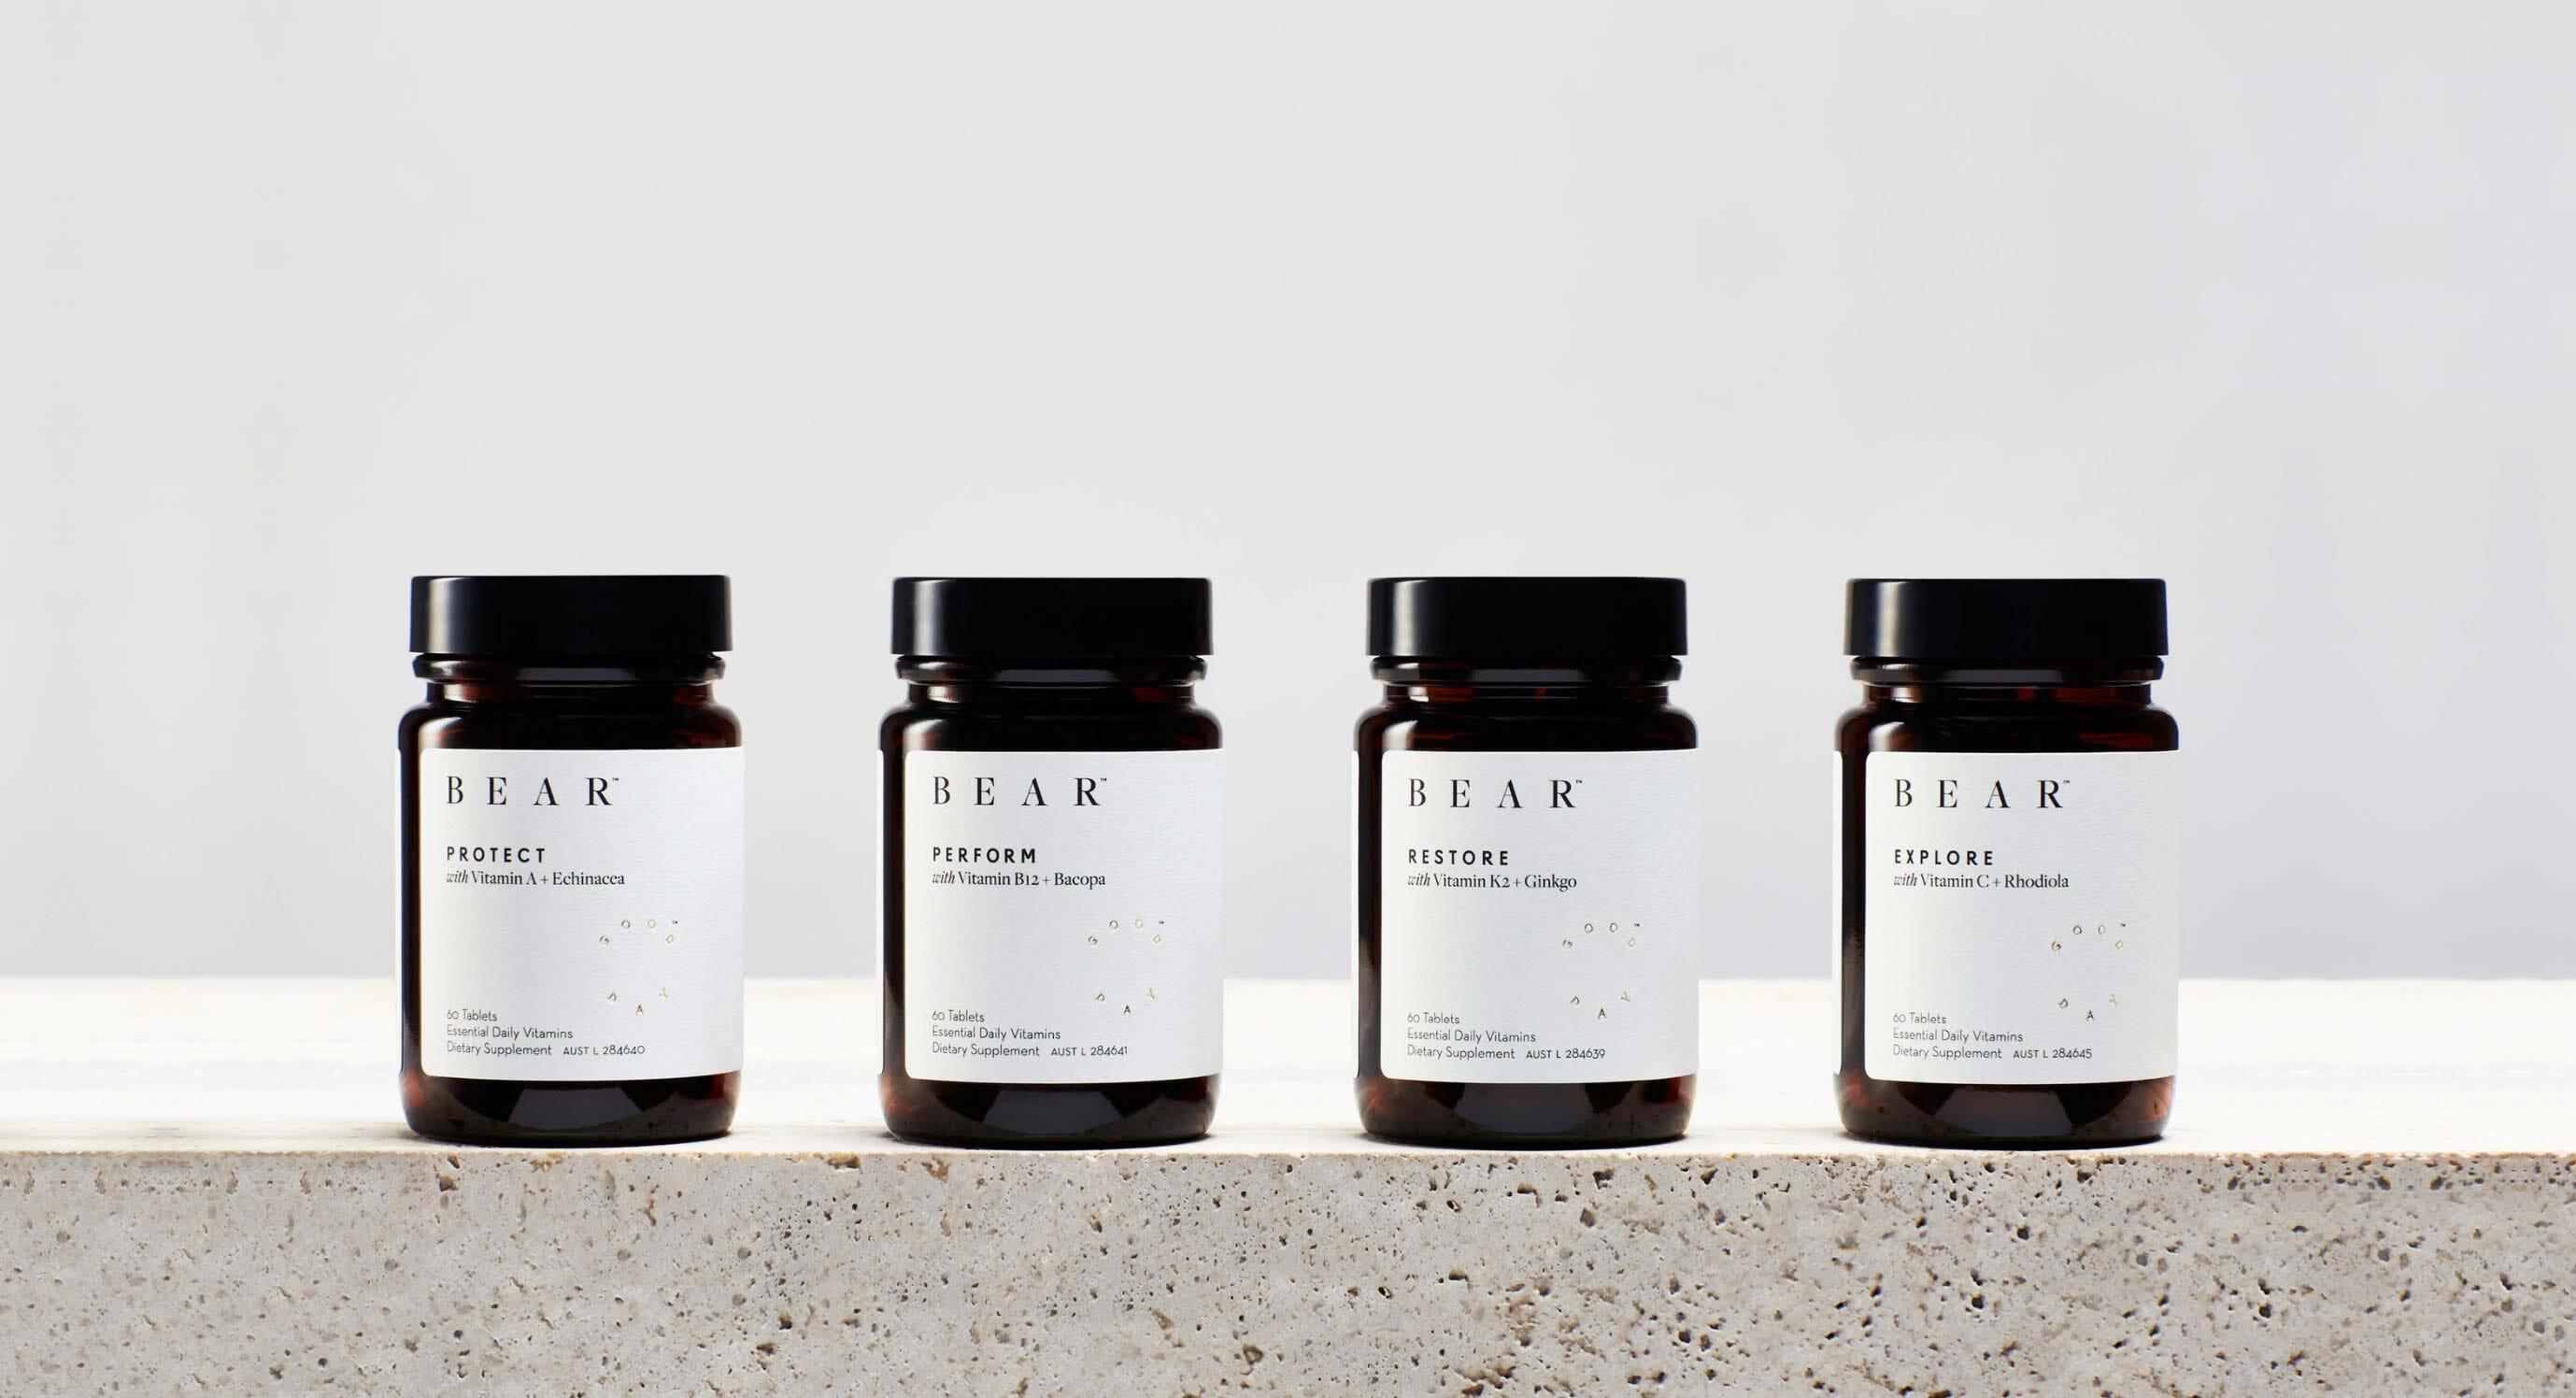 OPUMO Entrepreneurs: Sam Leetham, Co-Founder of BEAR Vitamins